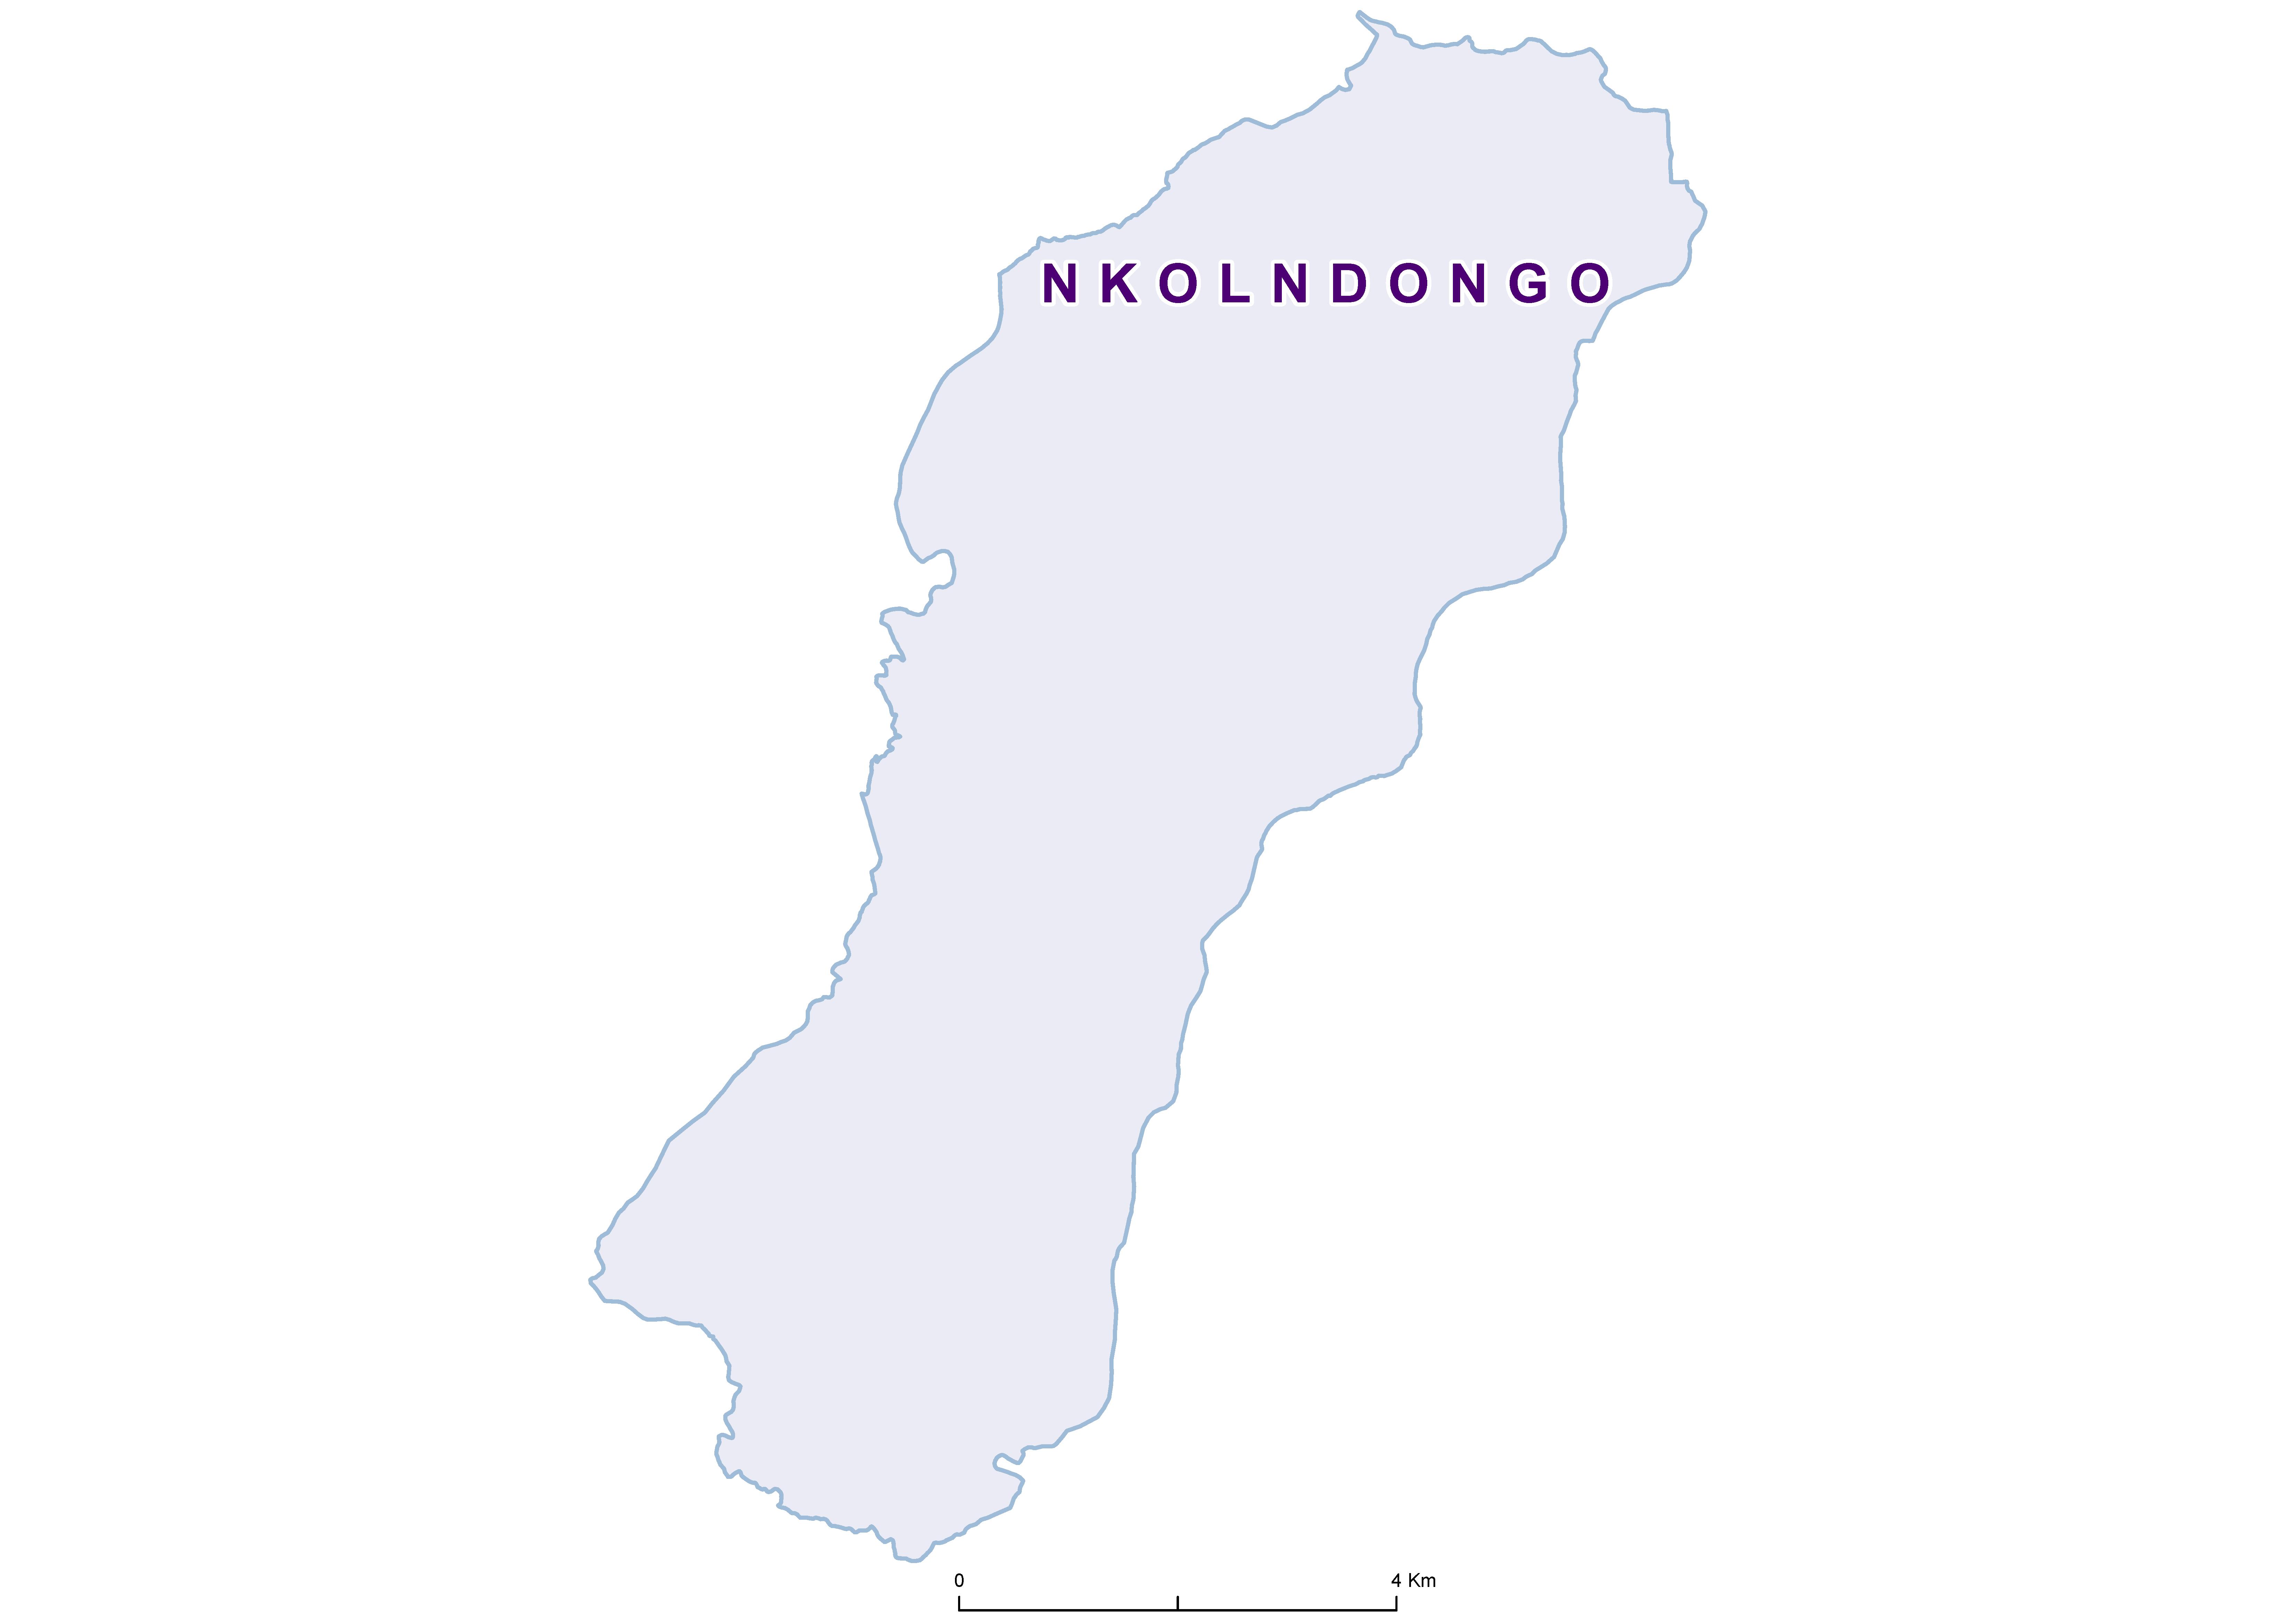 Nkolndongo Mean SCH 19850001